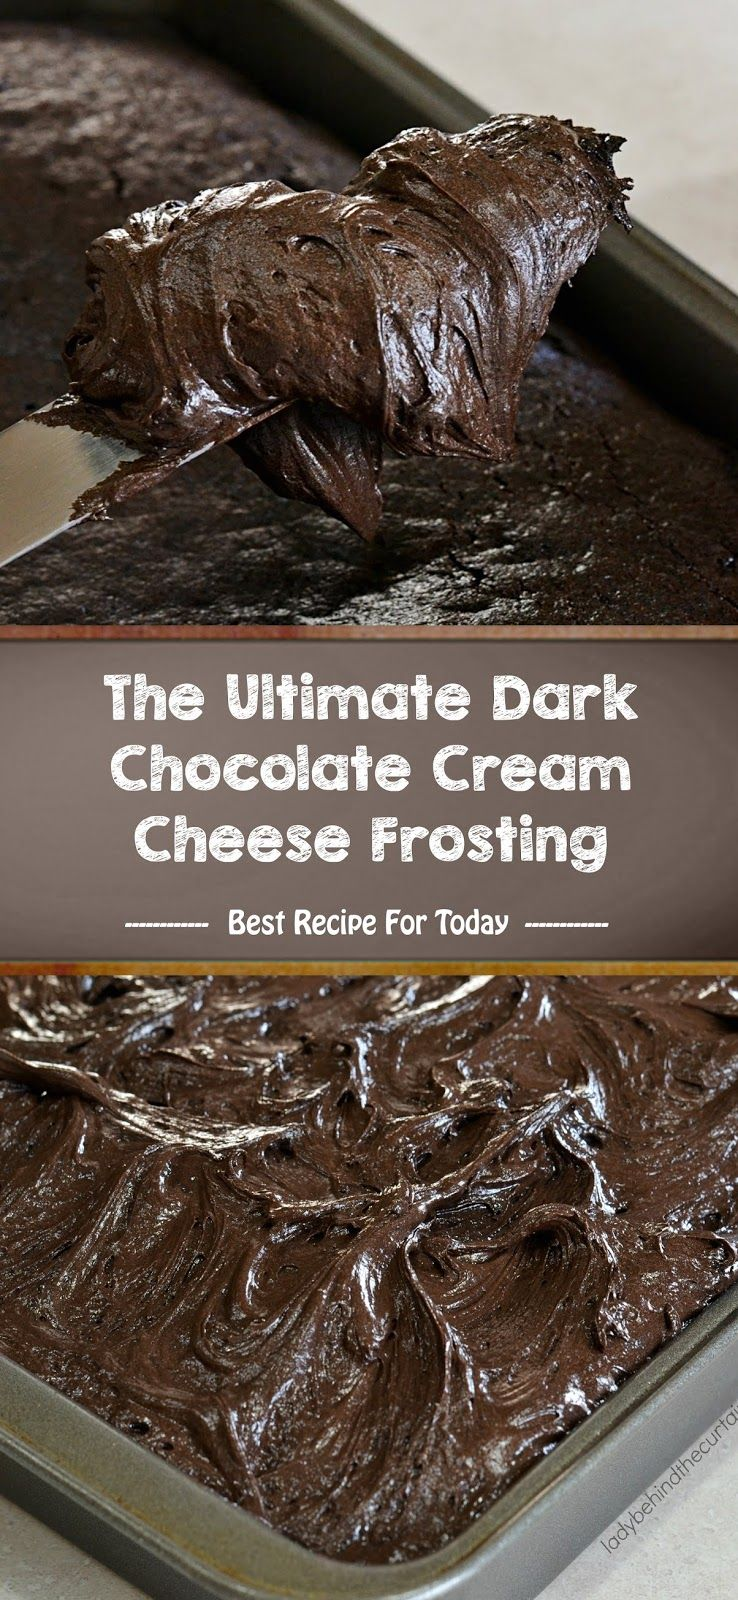 The Ultimate Dark Chocolate Cream Cheese Frosting Best Recipe 005 Resep Makanan Resep Makanan Penutup